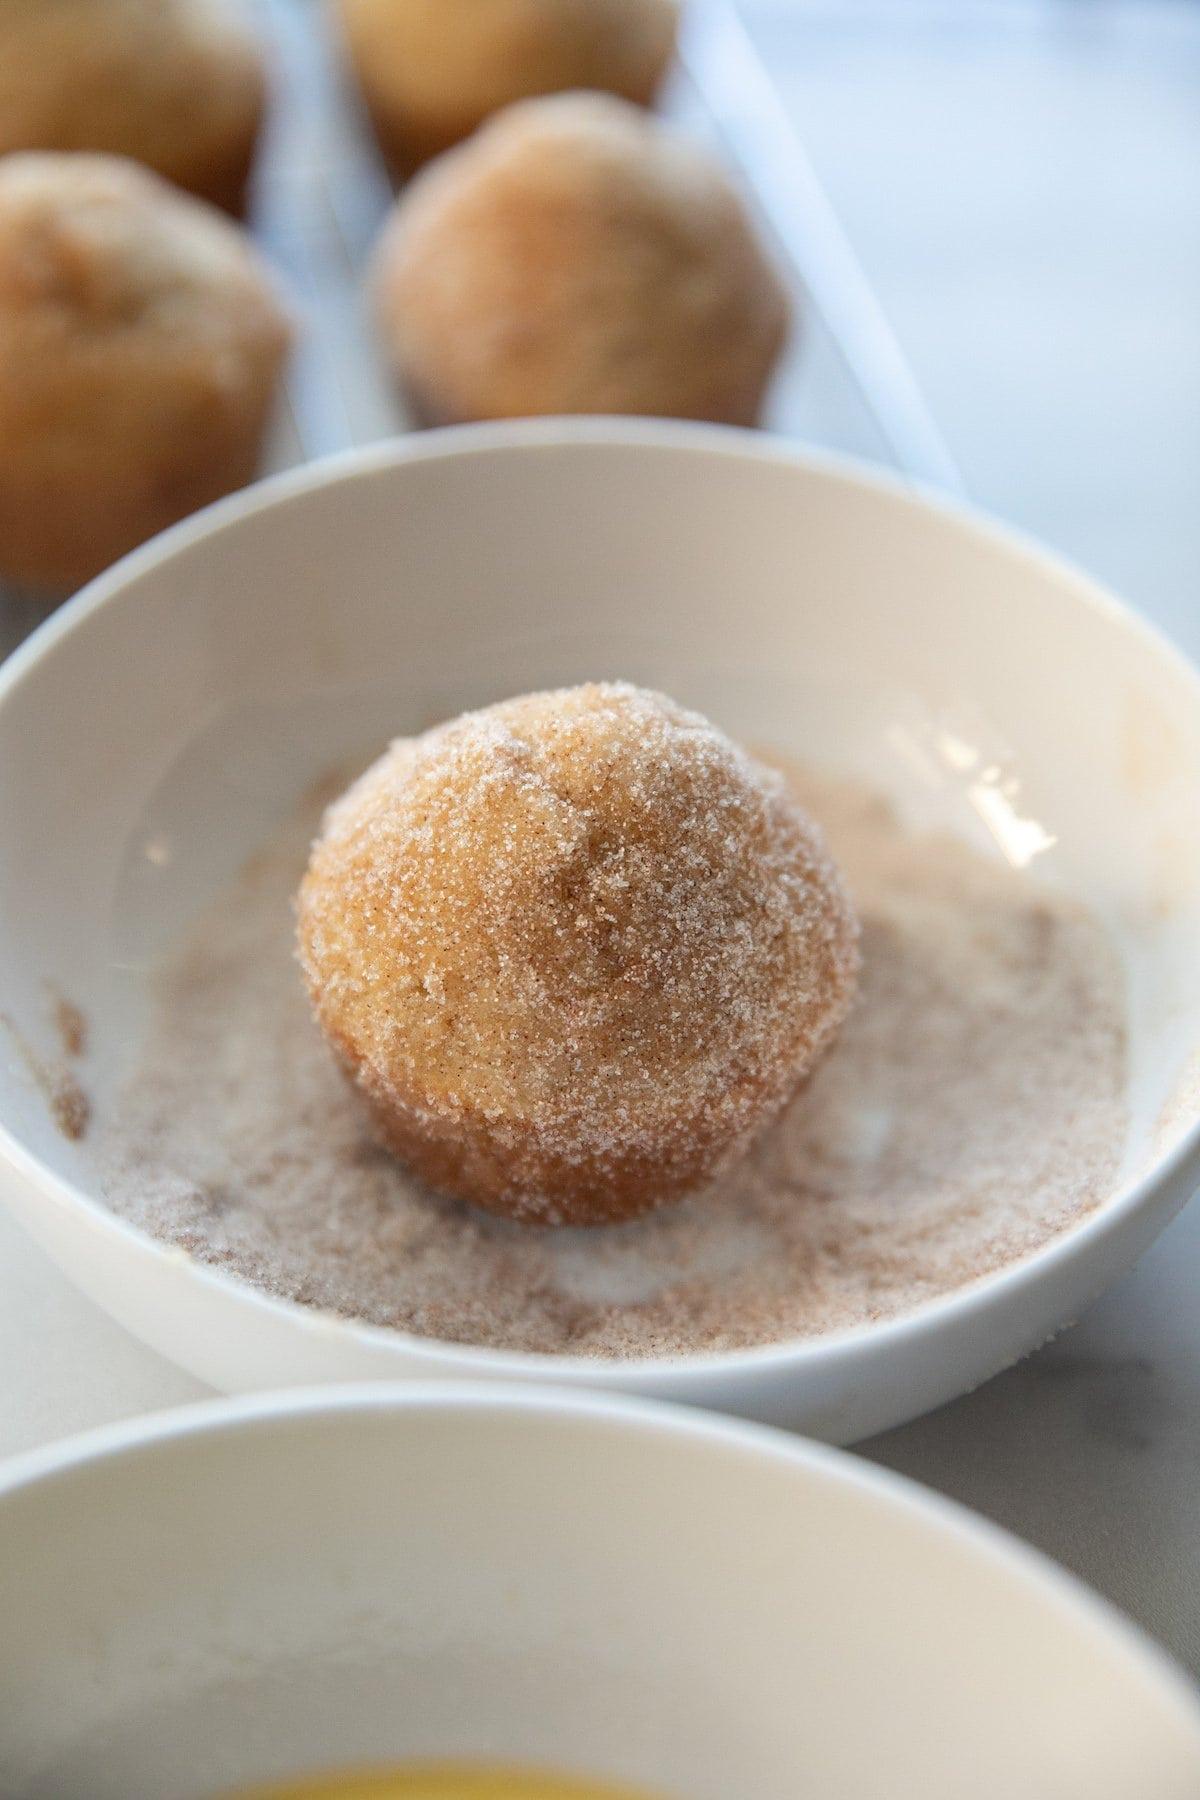 rolling muffin in cinnamon sugar